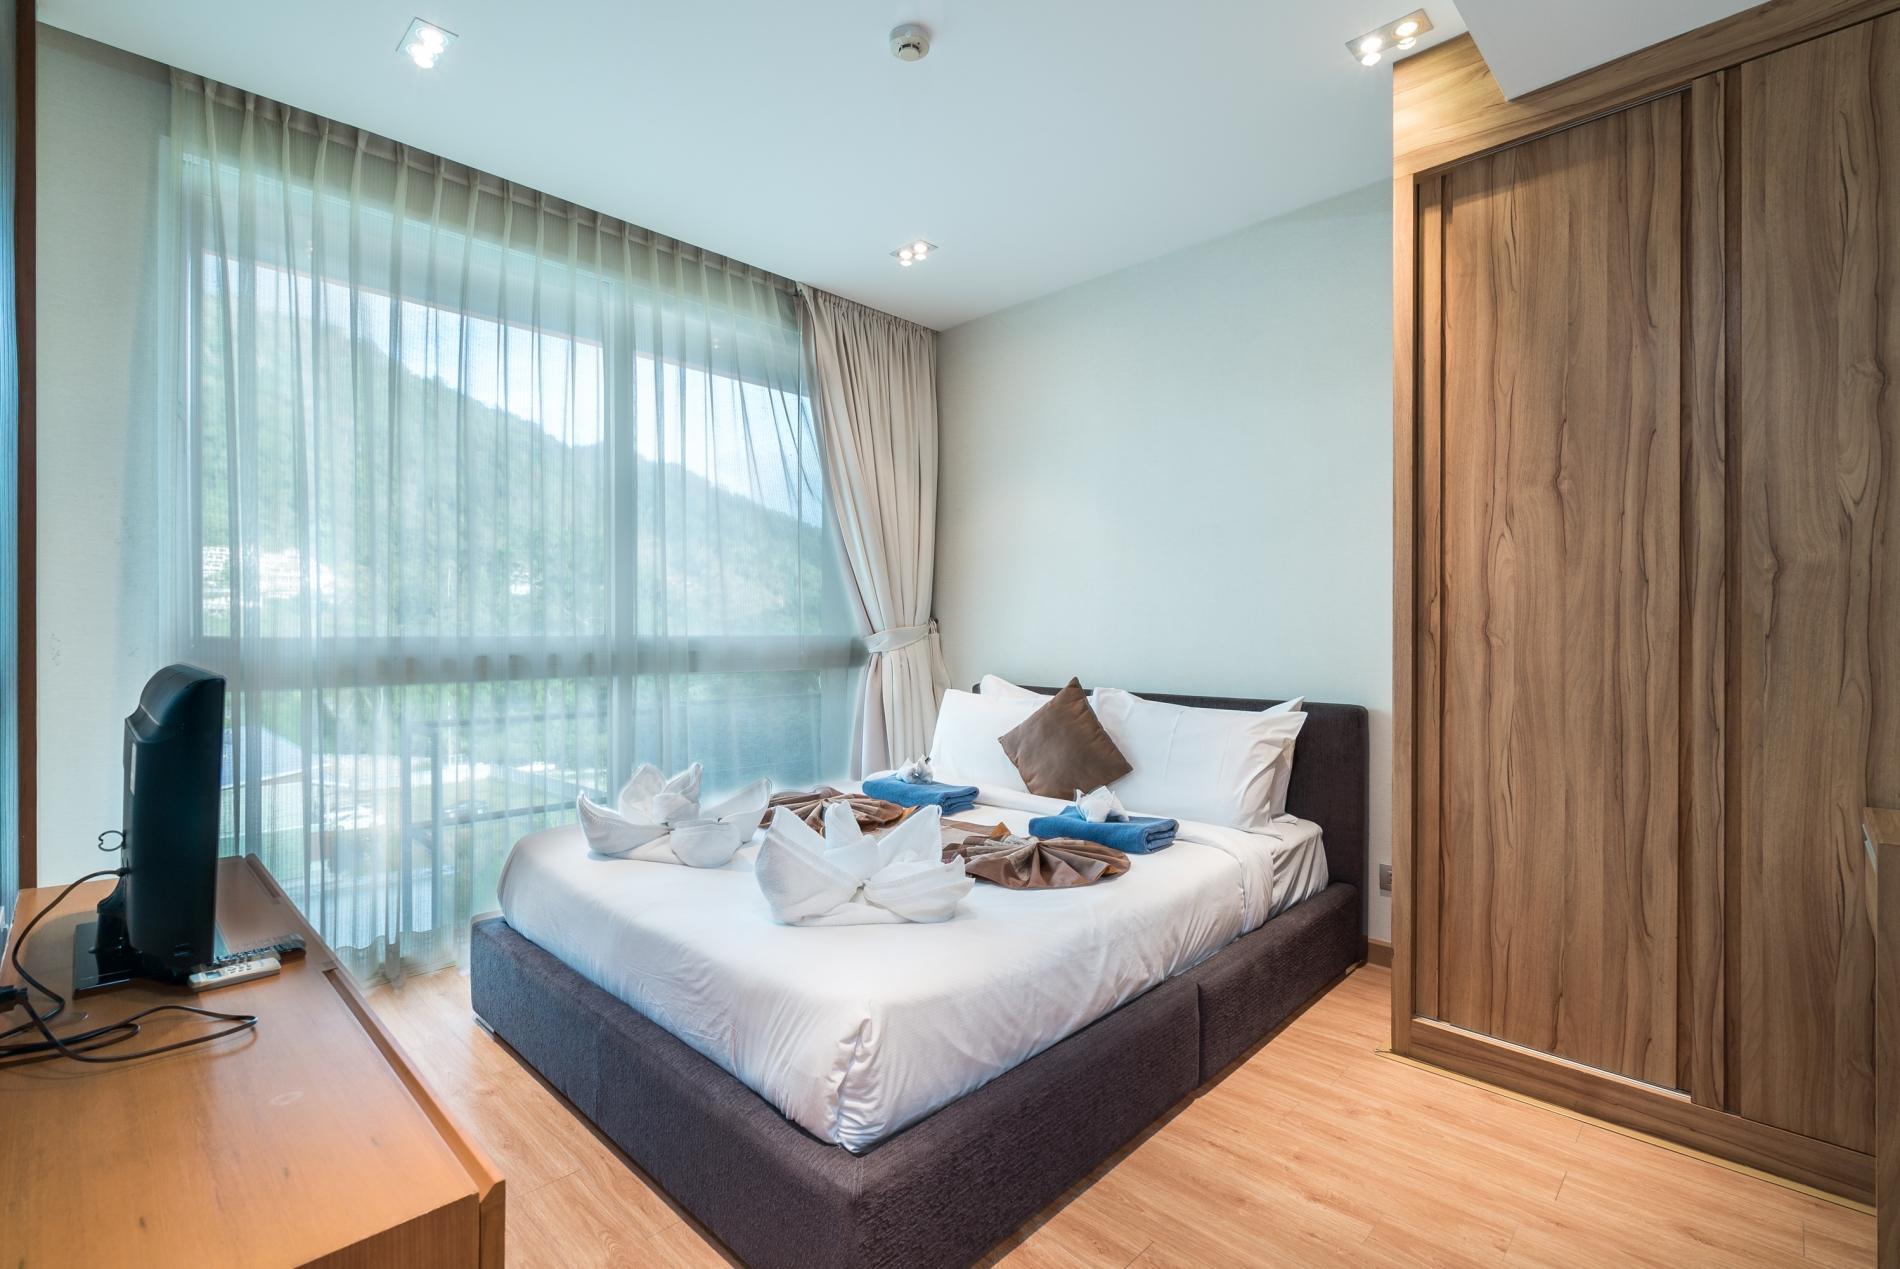 Privilege26 - Seaview plunge pool 3 bedroom luxury apartment on Kalim bay photo 15811727